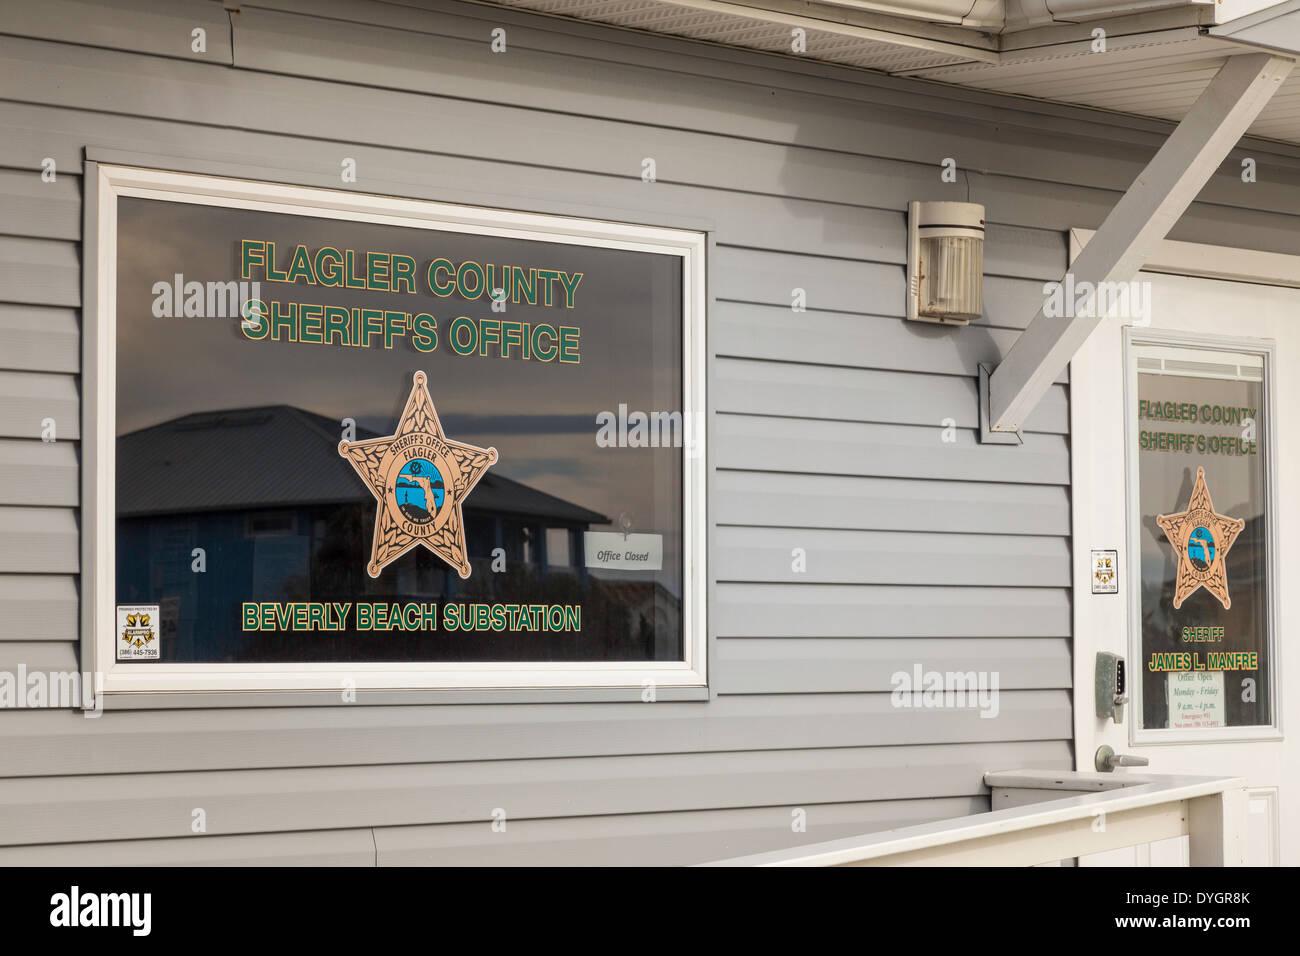 Sheriffs Stock Photos & Sheriffs Stock Images - Alamy